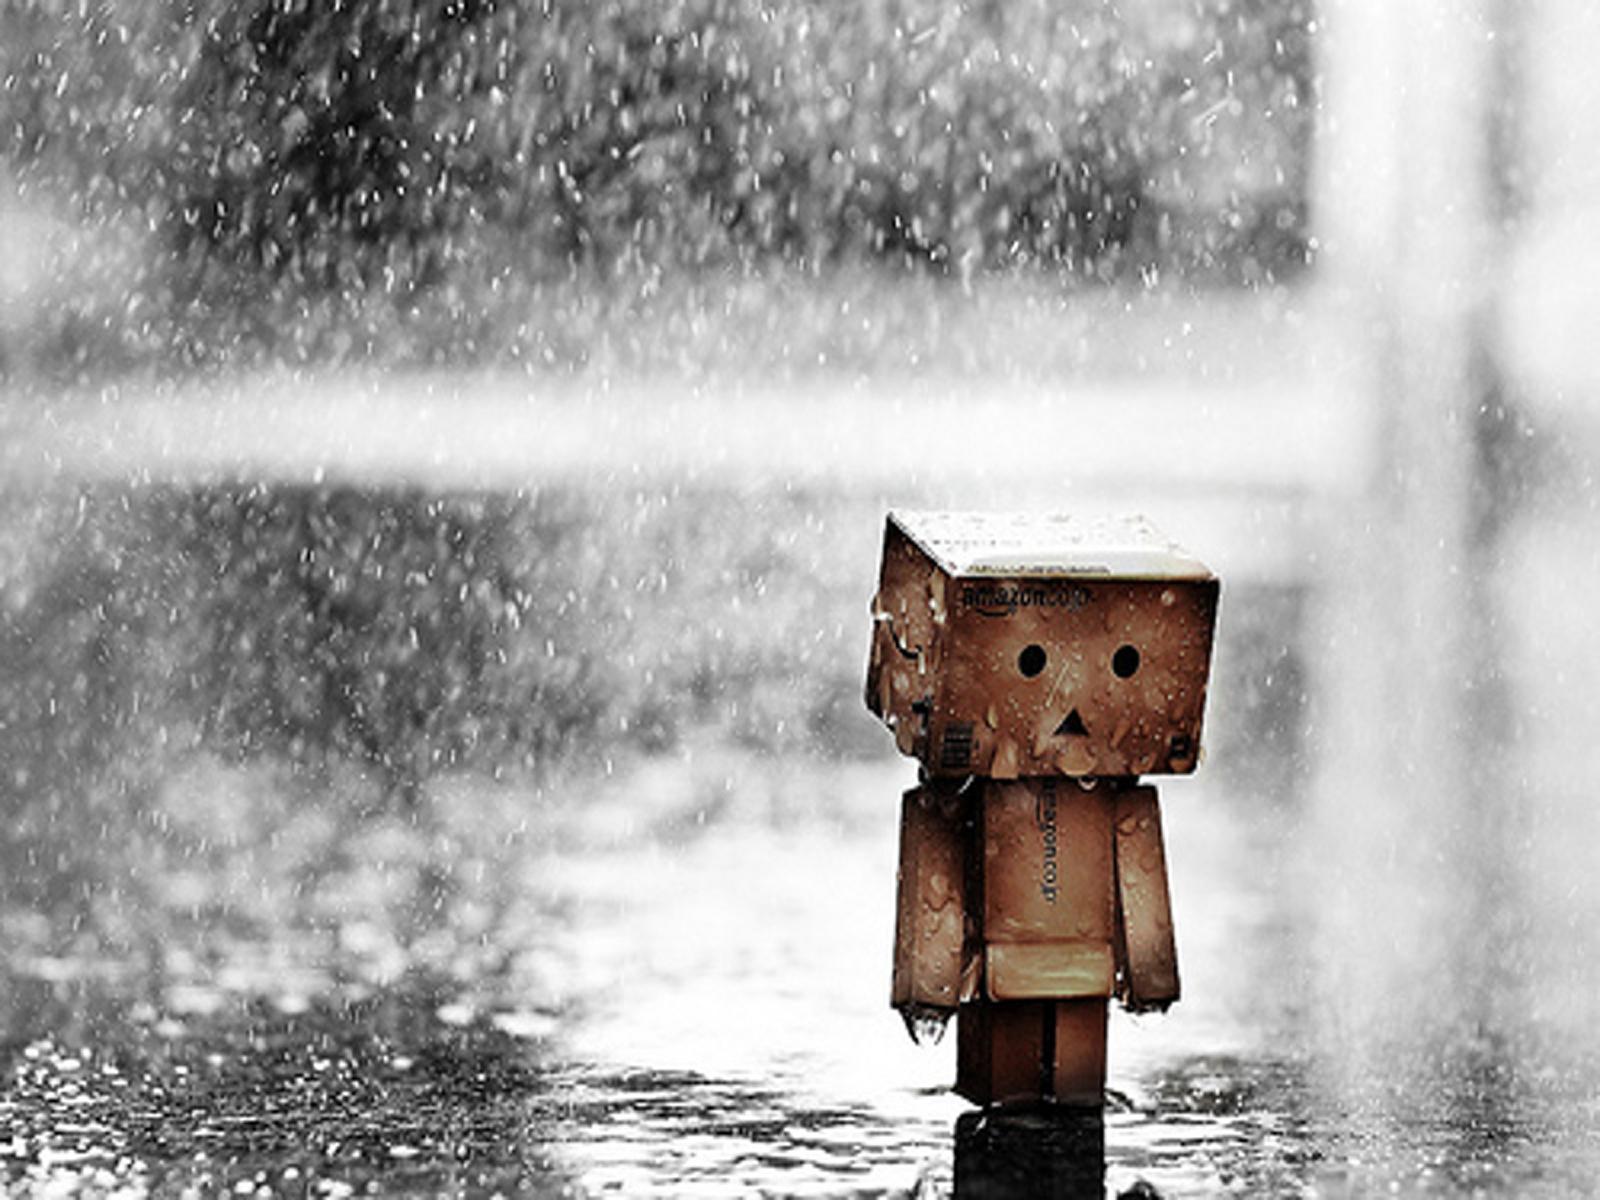 http://1.bp.blogspot.com/-rT9sUbfoqz8/TmfxVJo8iPI/AAAAAAAAA2Q/Vm9pIztAKgc/s1600/danboard_boxman_kutu_adam_rain_cry_www.Vvallpaper.net.jpg